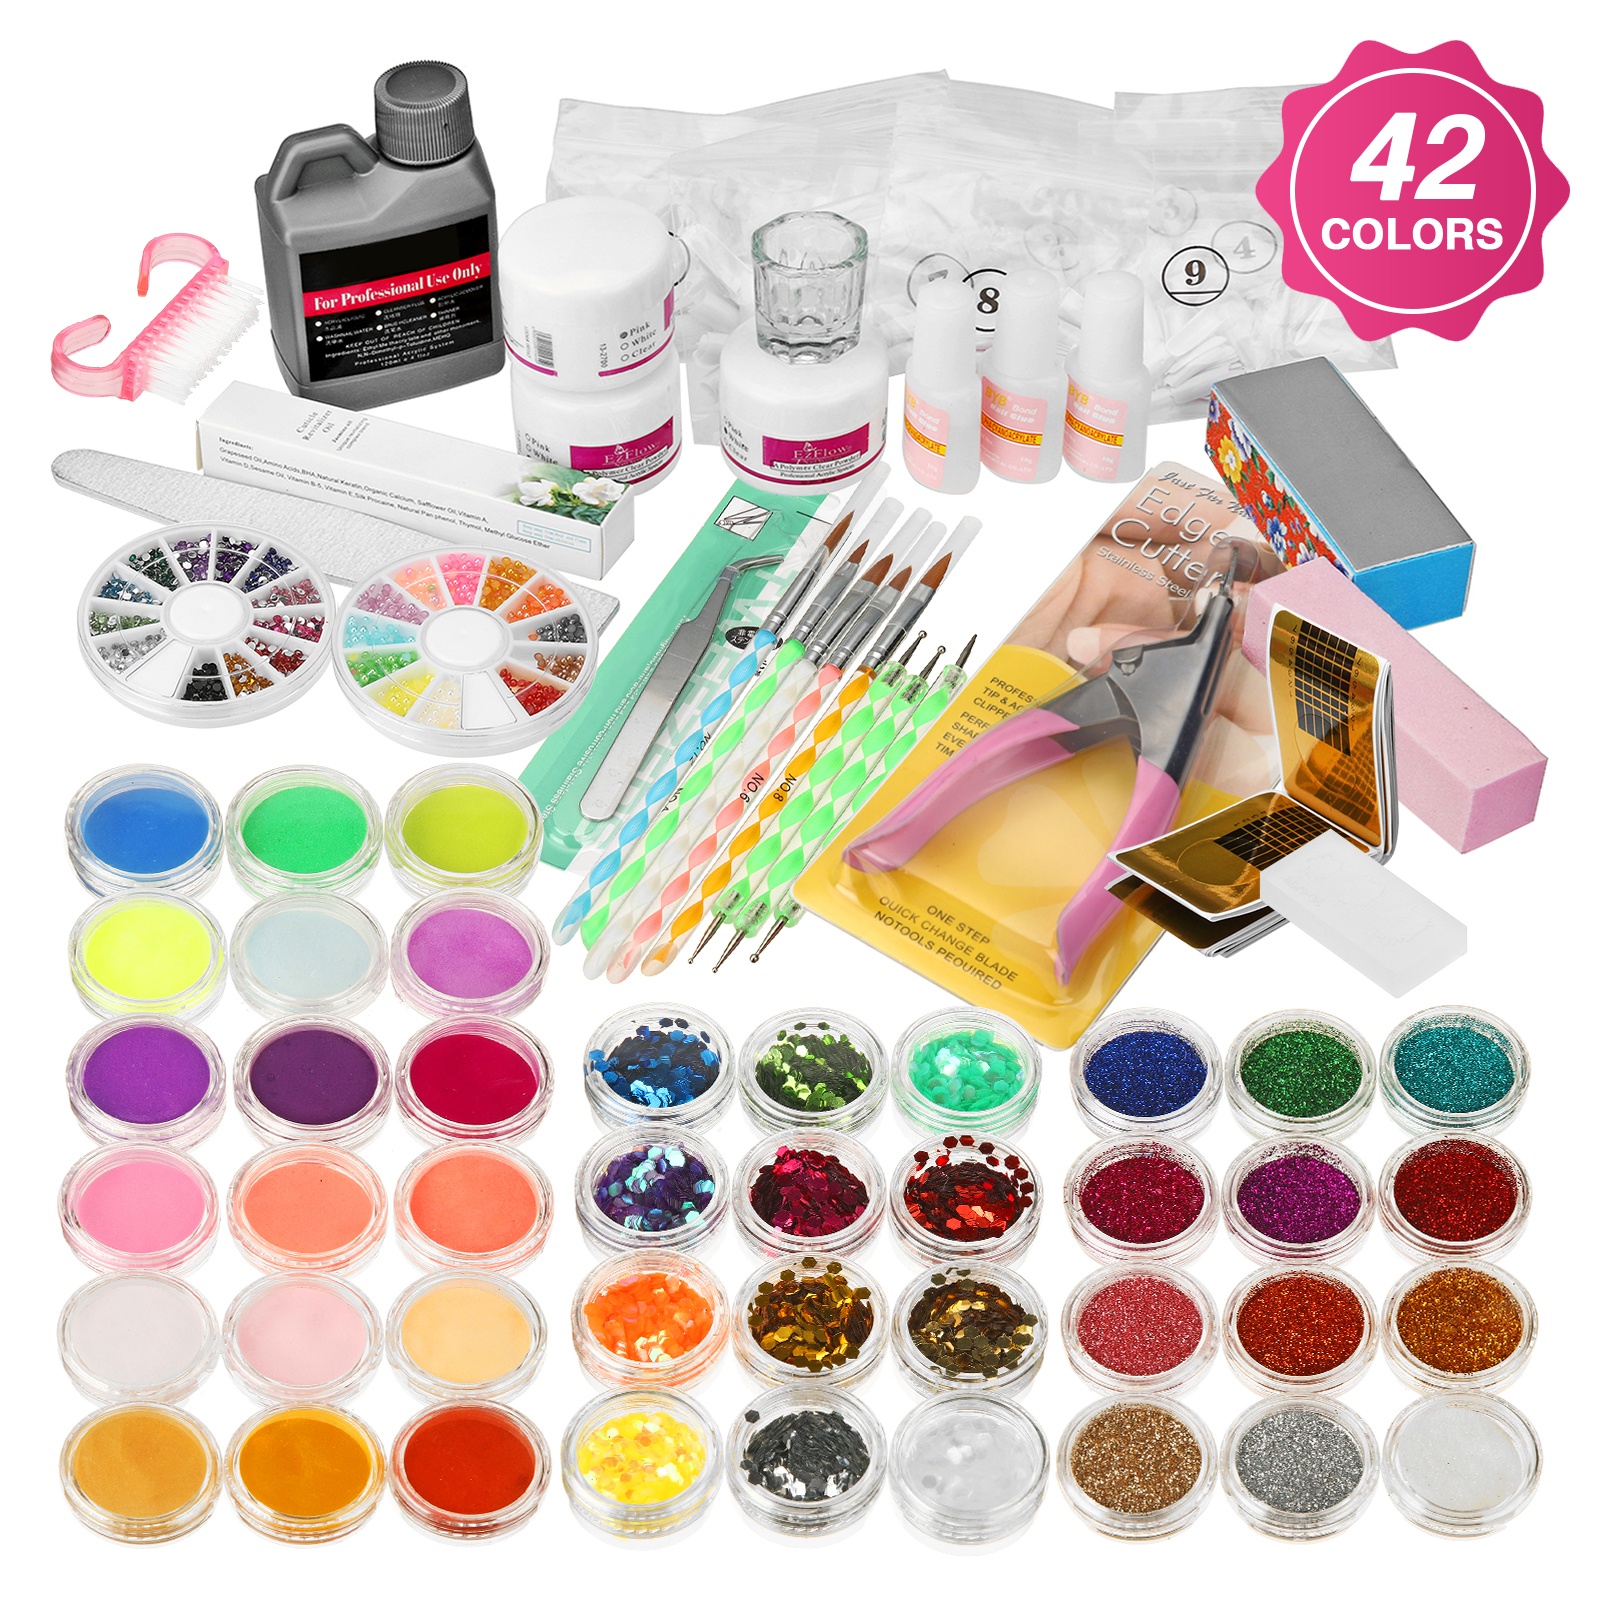 Janolia 42 Colors Professional Acrylic Powder Nail Art Set w/ Manicure Kit